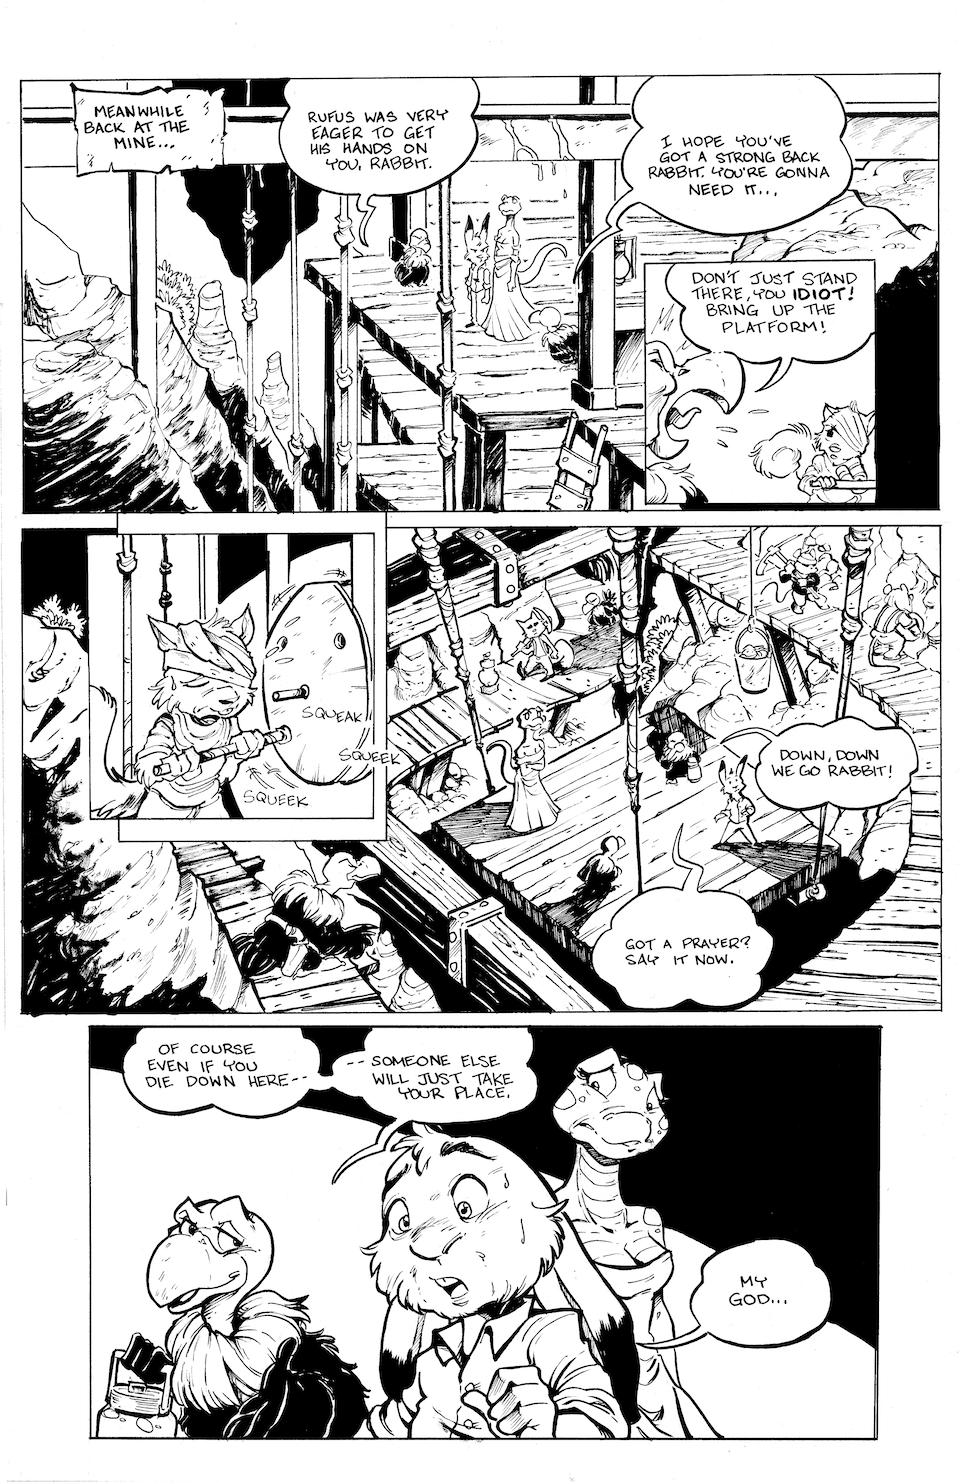 Jasper Gold 03 – Pg. 27